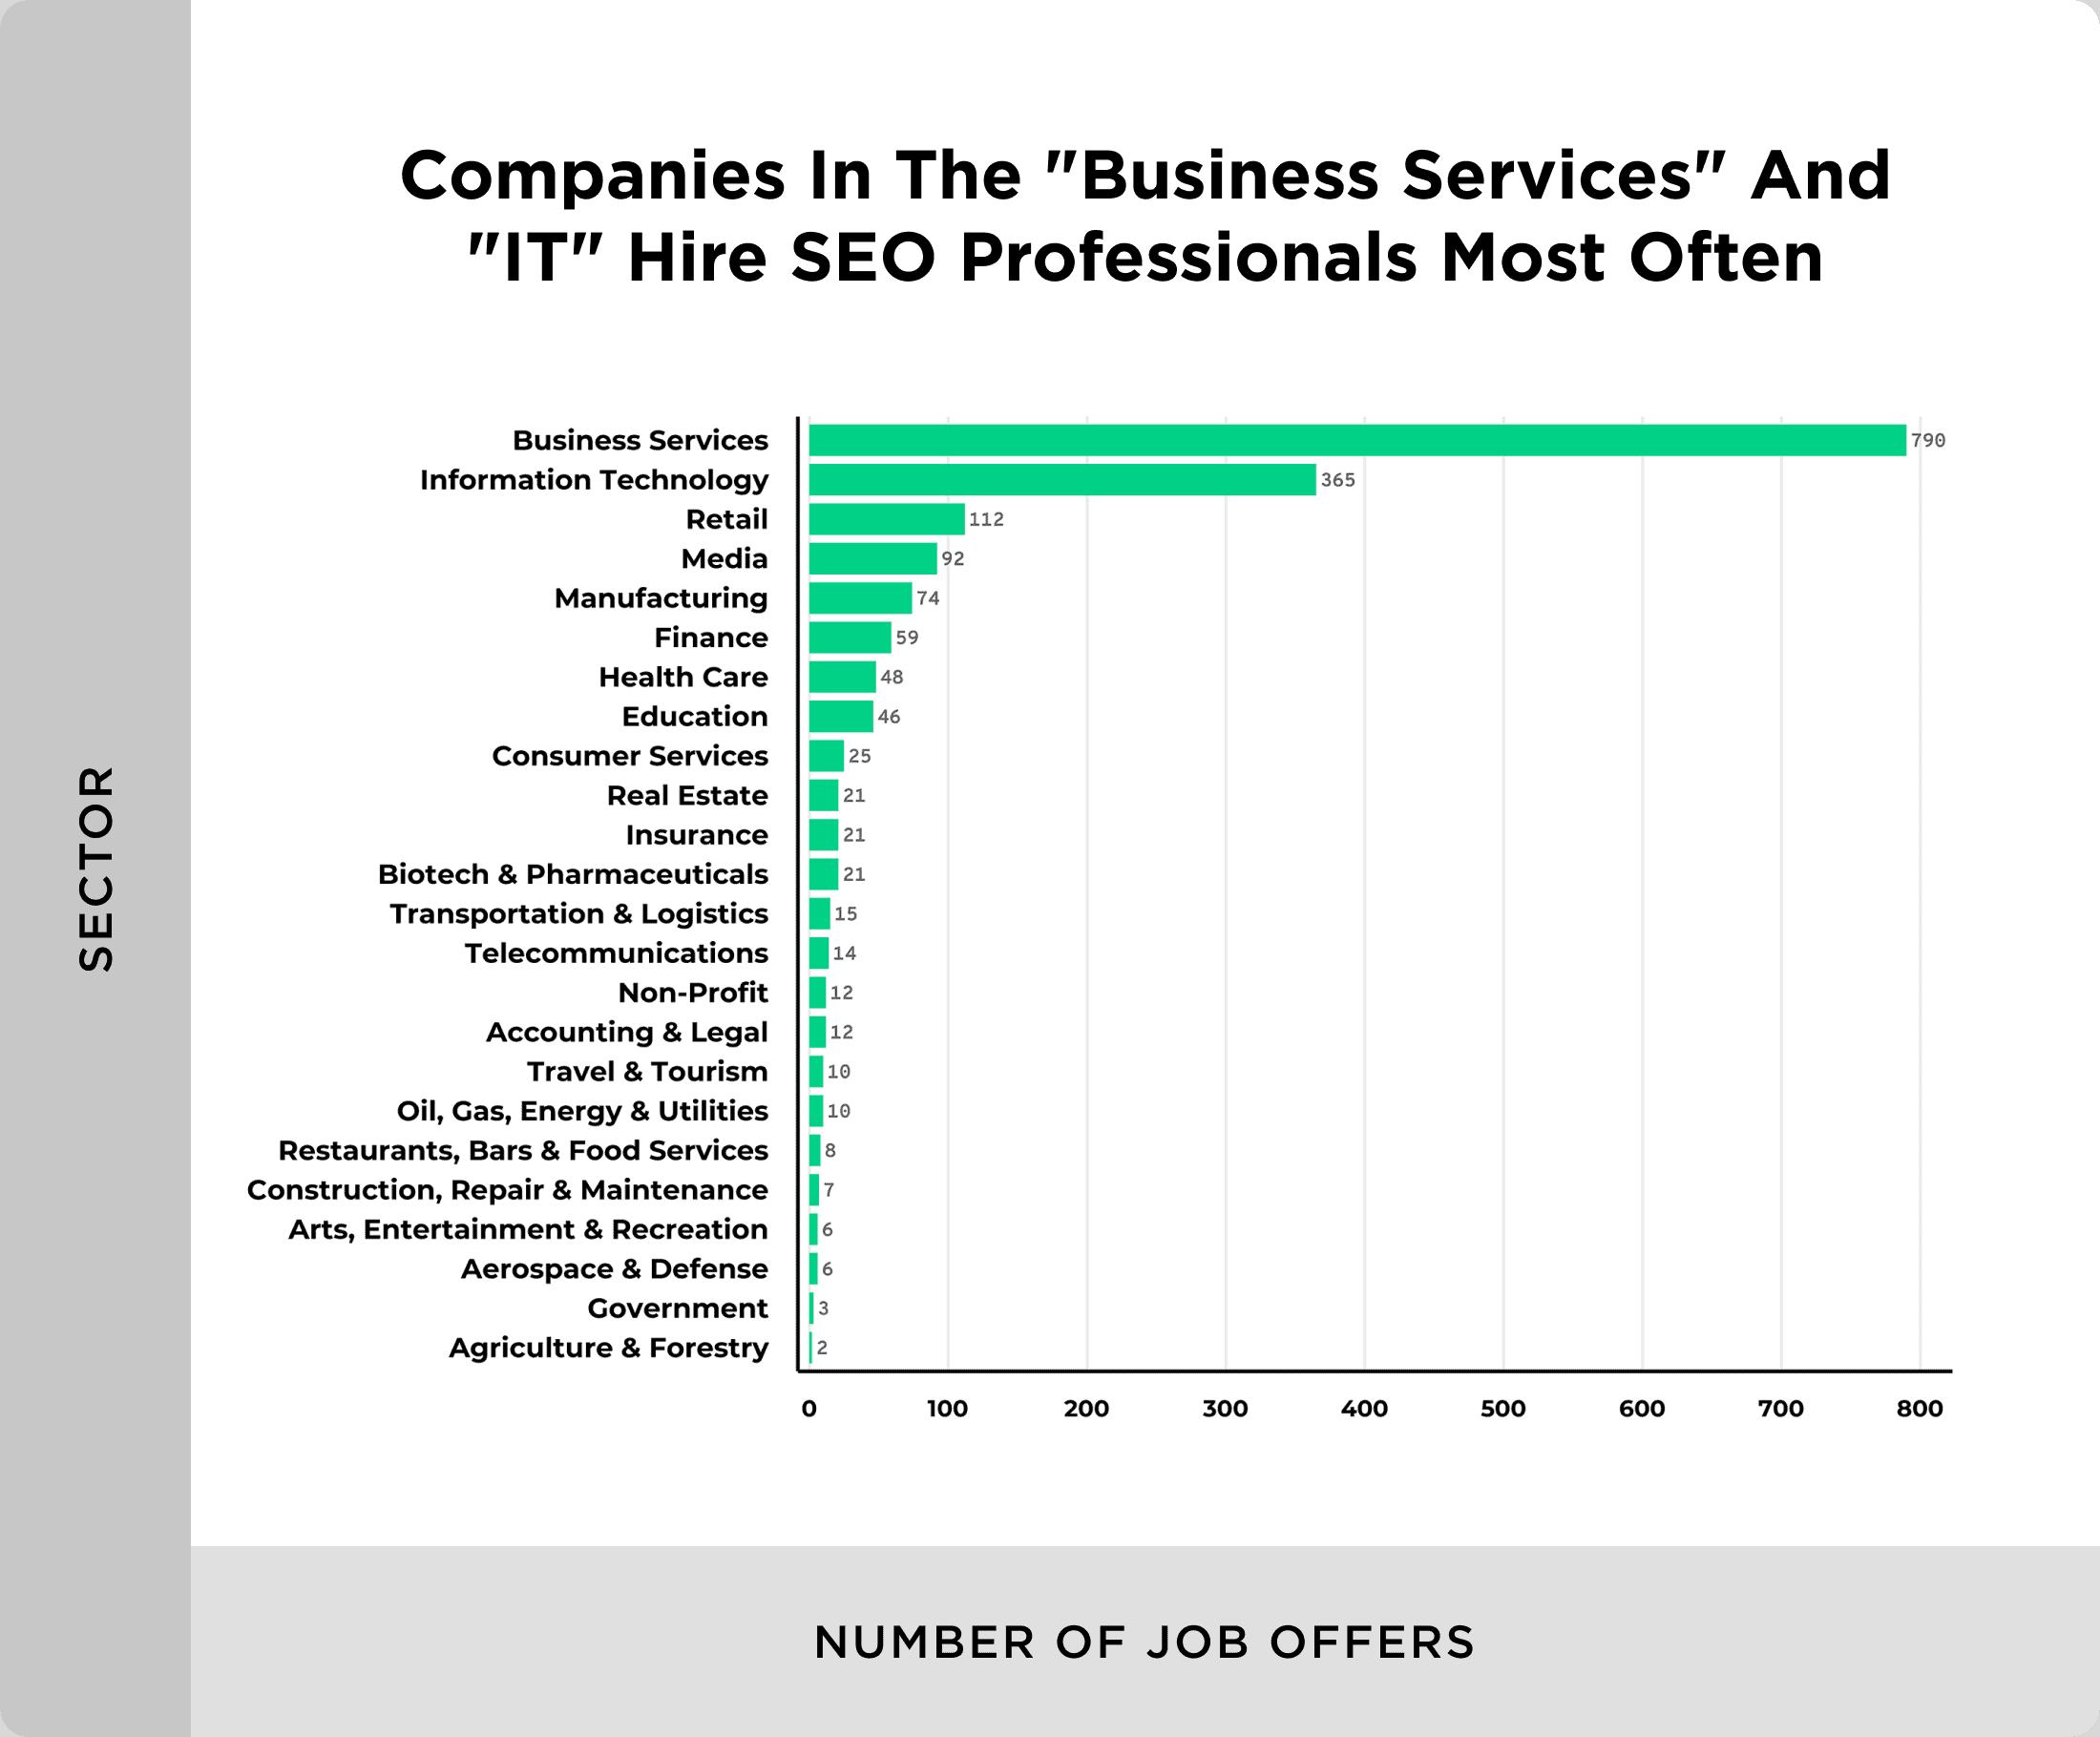 SEO job postings by sector